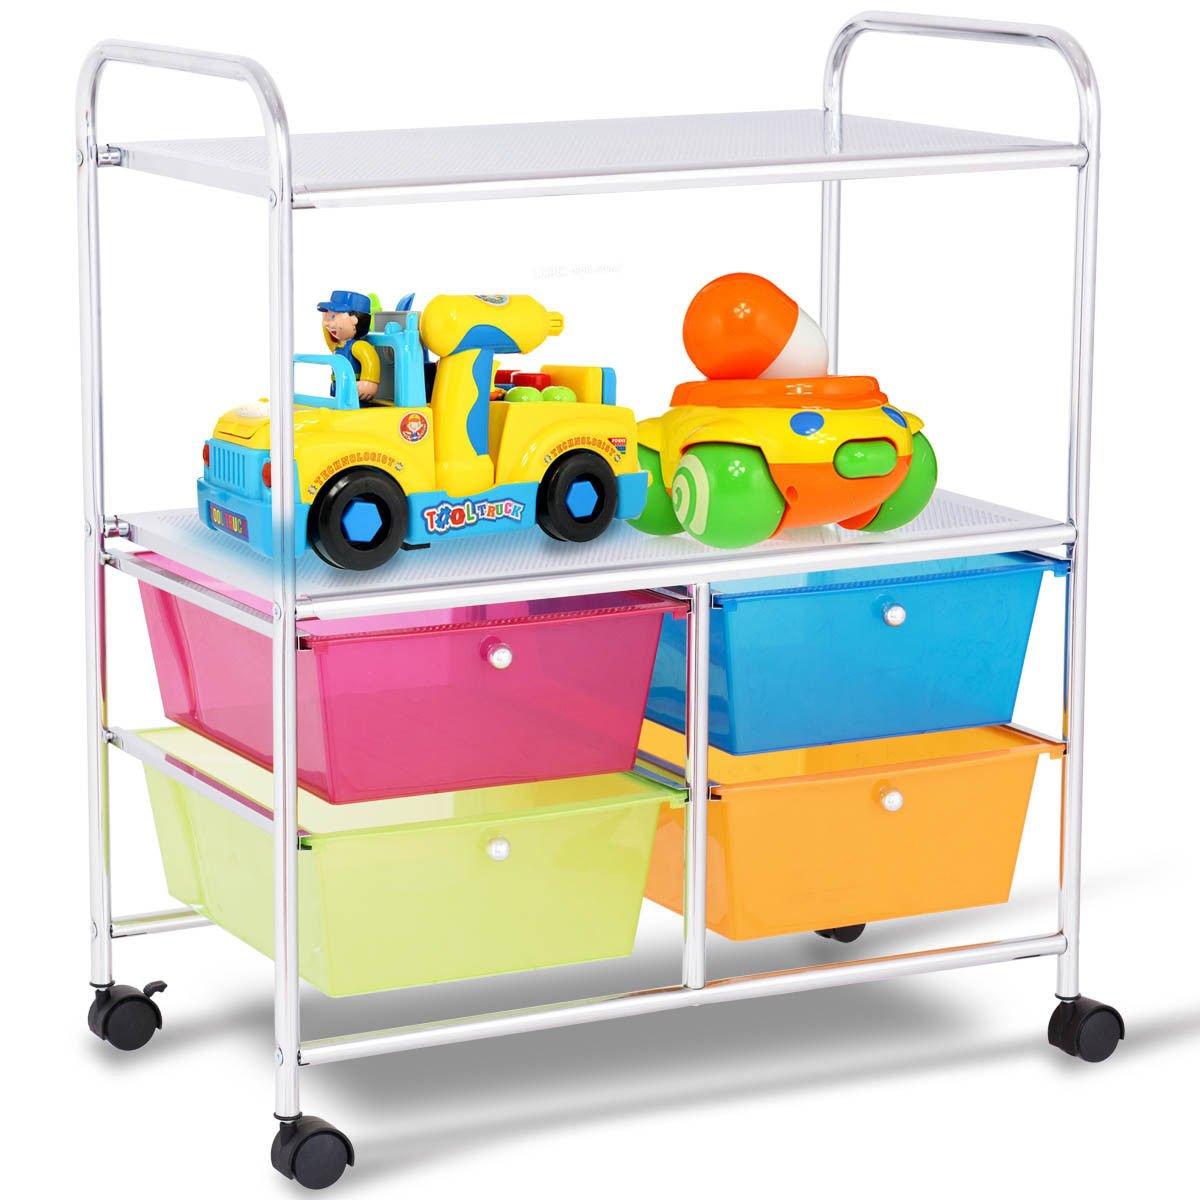 Giantex Rolling Storage Cart w/ 4 Drawers 2 Shelves Metal Rack Shelf Home Office School Beauty Salon Utility Organizer Cart with Wheels (Blue Green Orange & Red) by Giantex (Image #3)